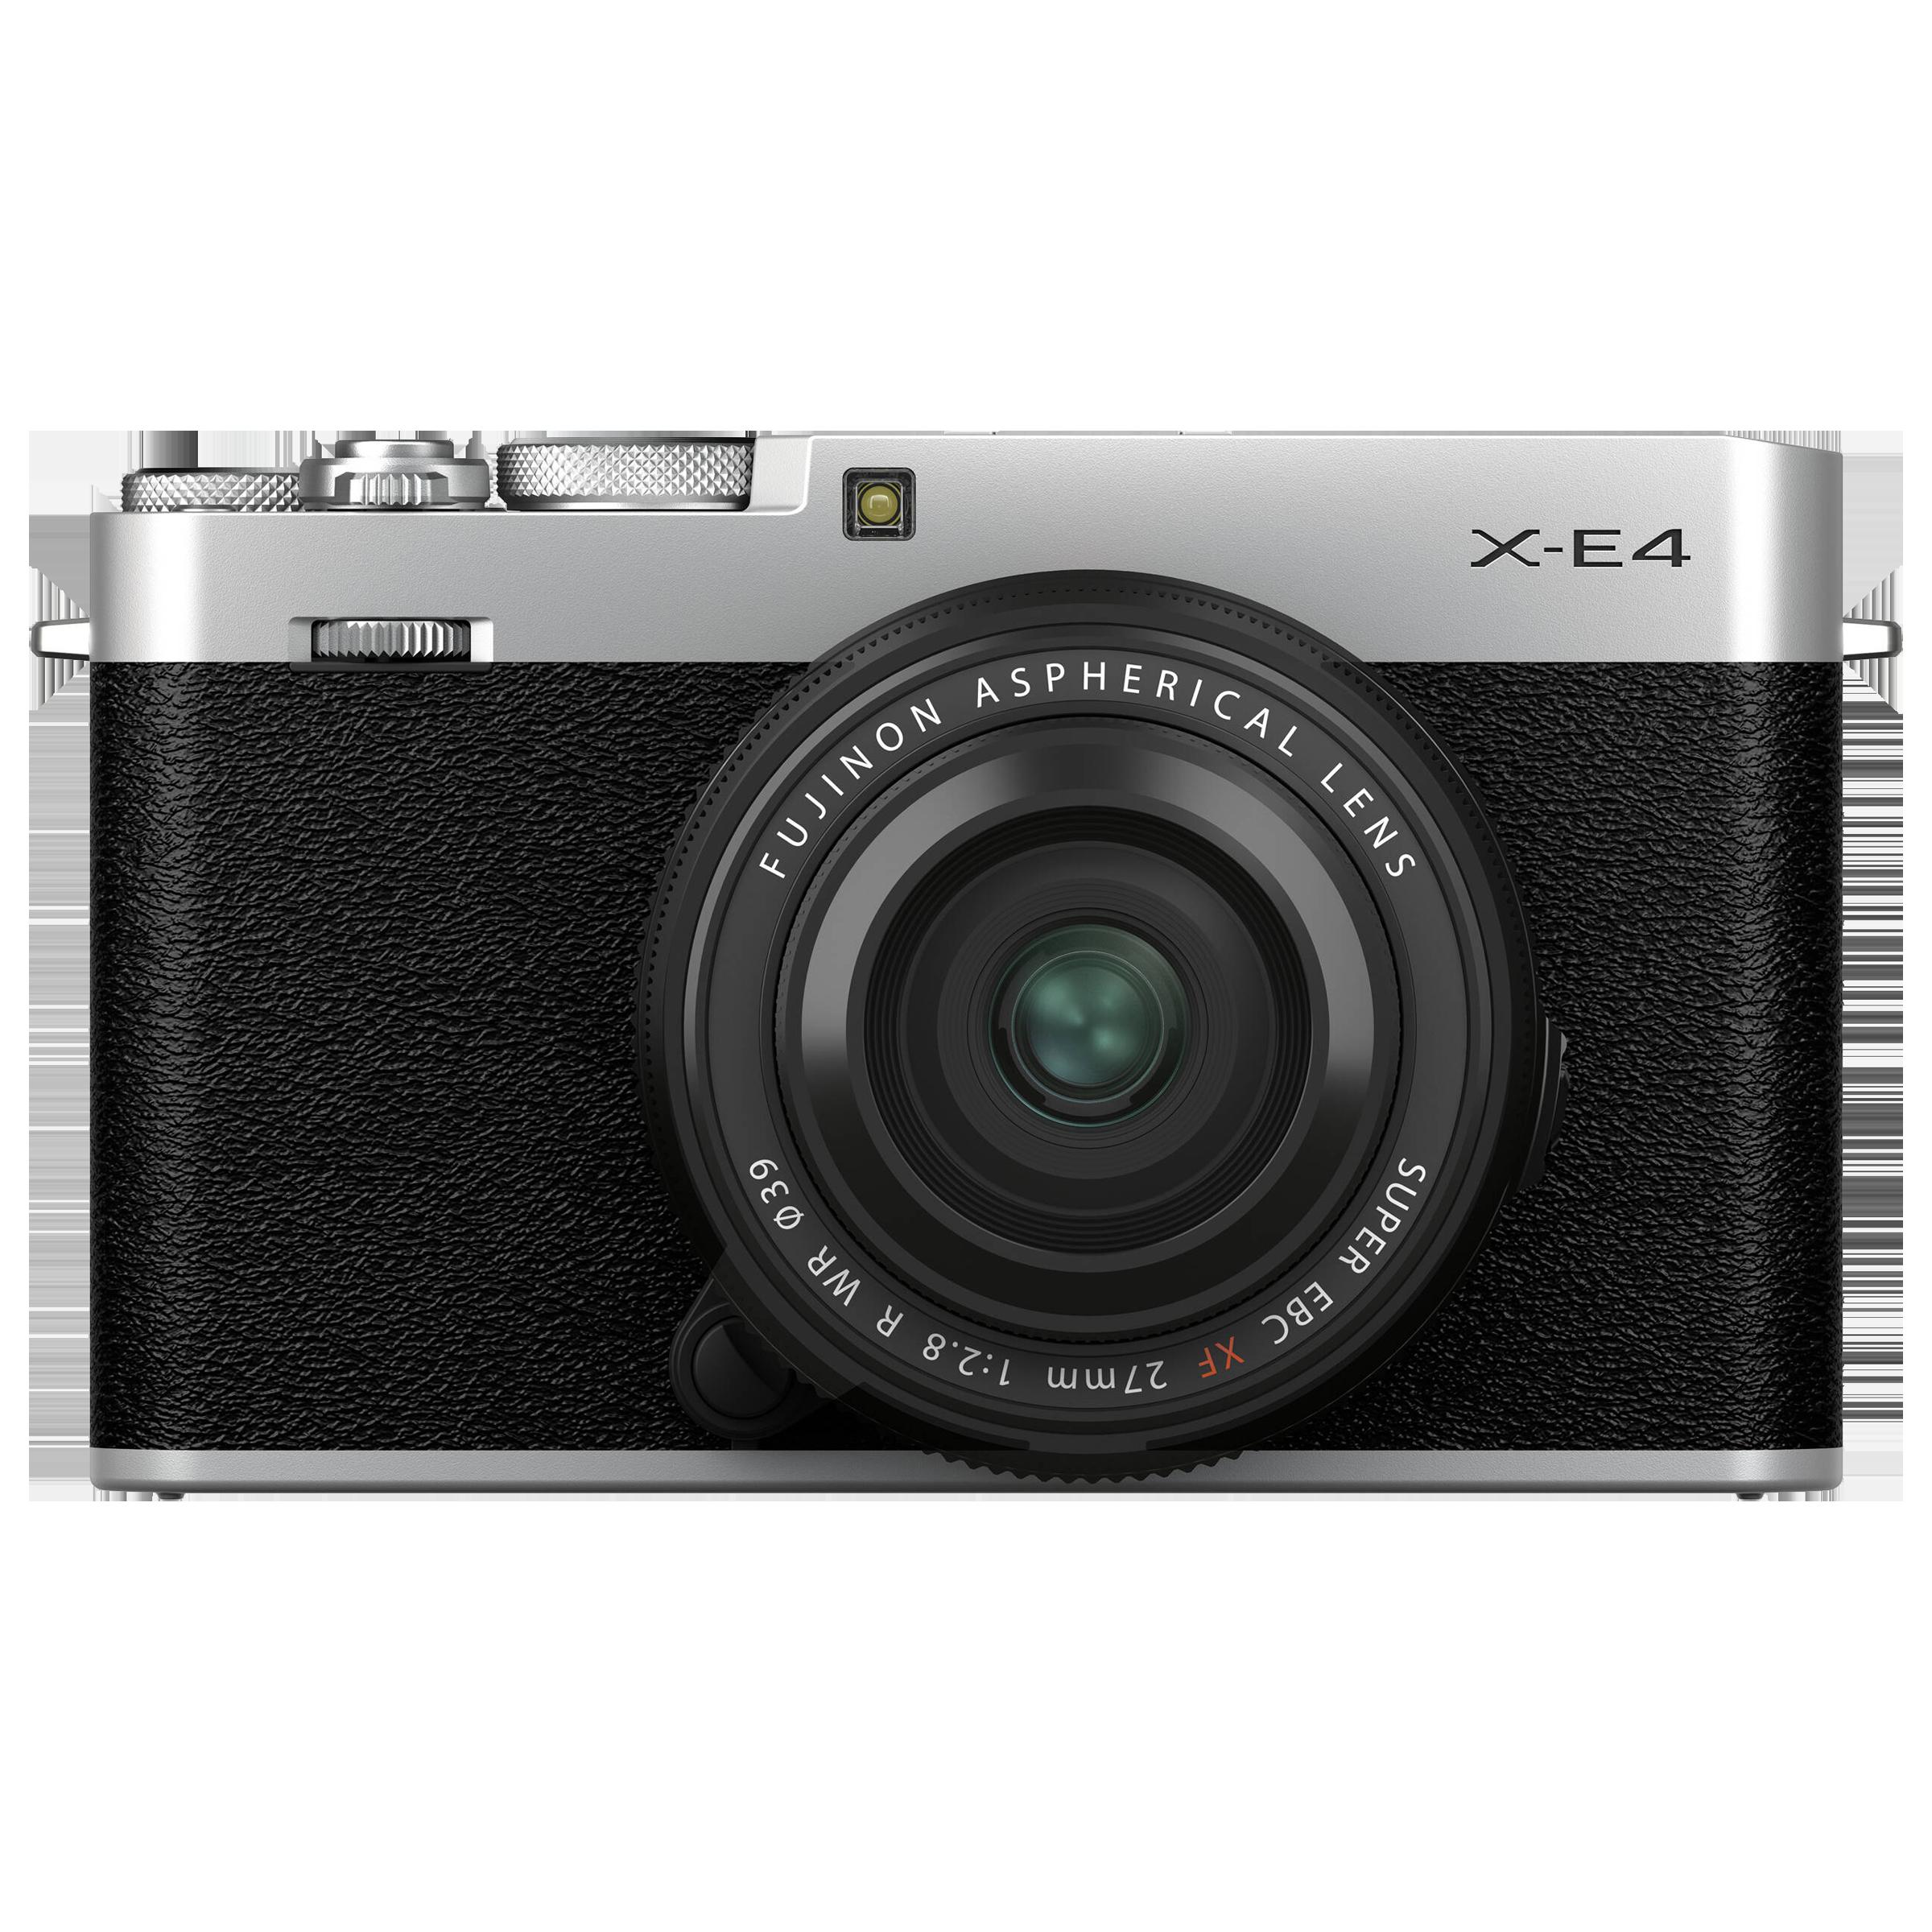 Fujifilm X-E4 26.1MP Mirrorless Camera (XF 27 mm Lens, X-Trans CMOS 4 Sensor, Silver)_1